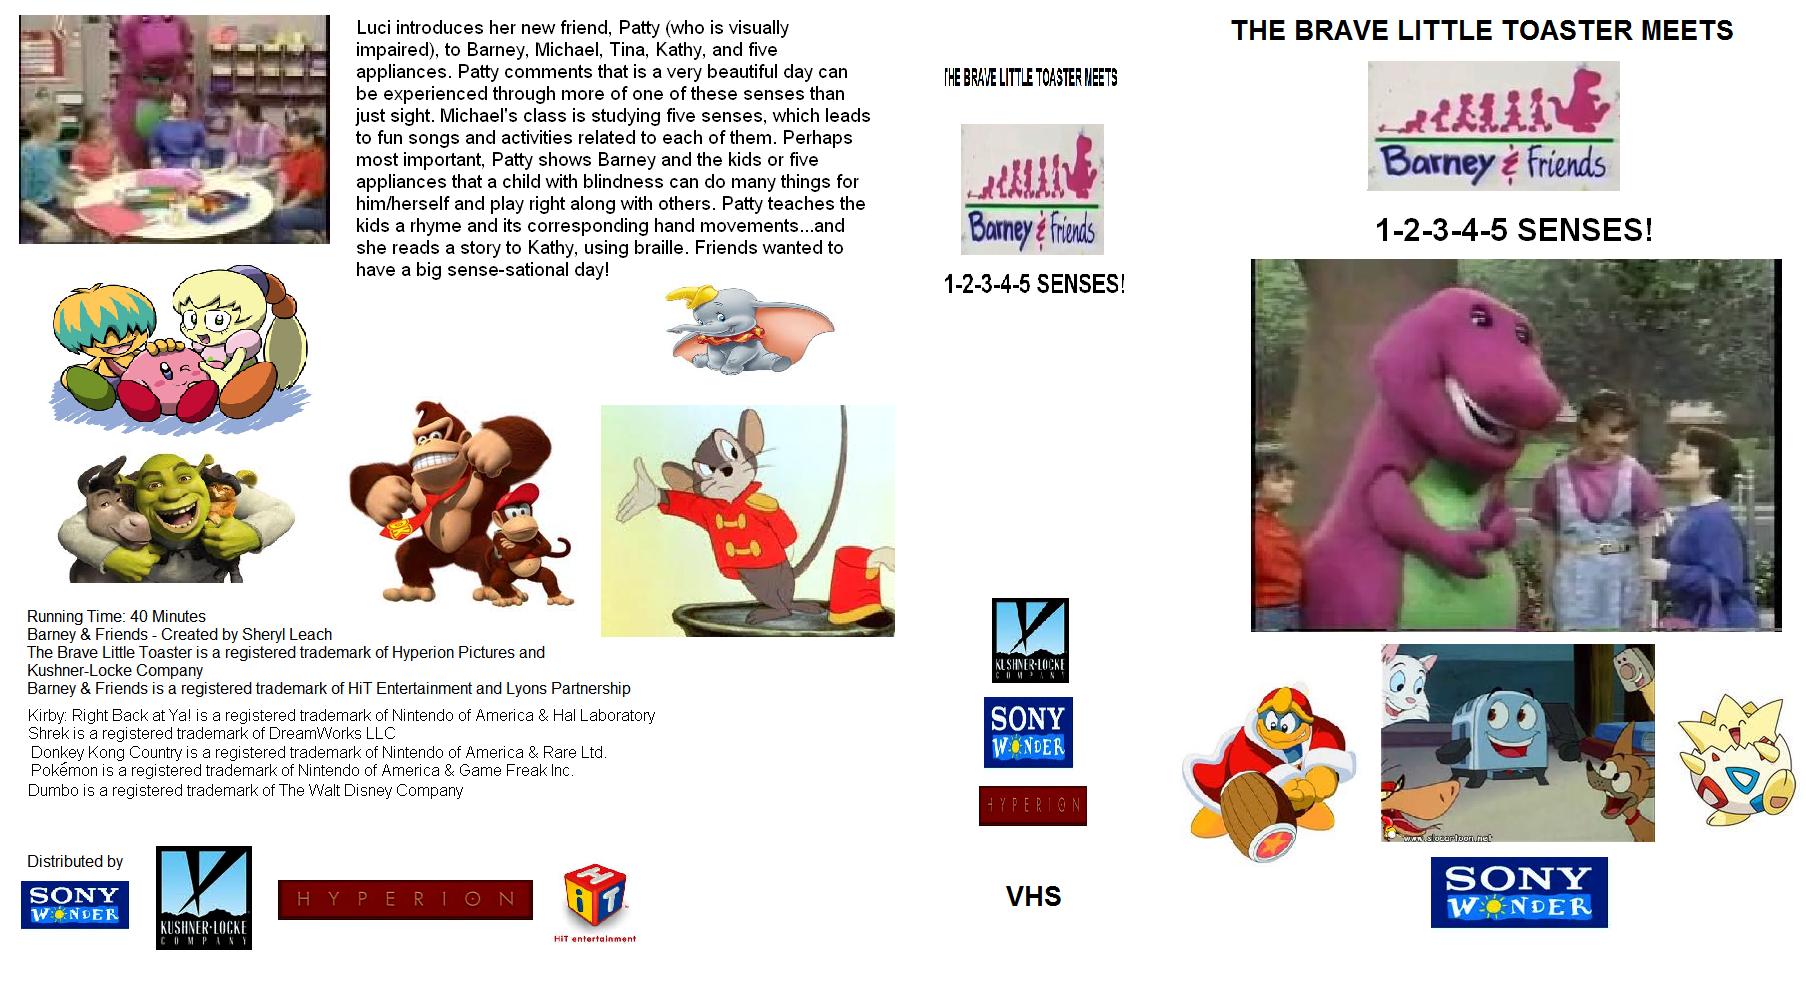 The brave little toaster meets barney amp friends 1 2 3 4 5 senses